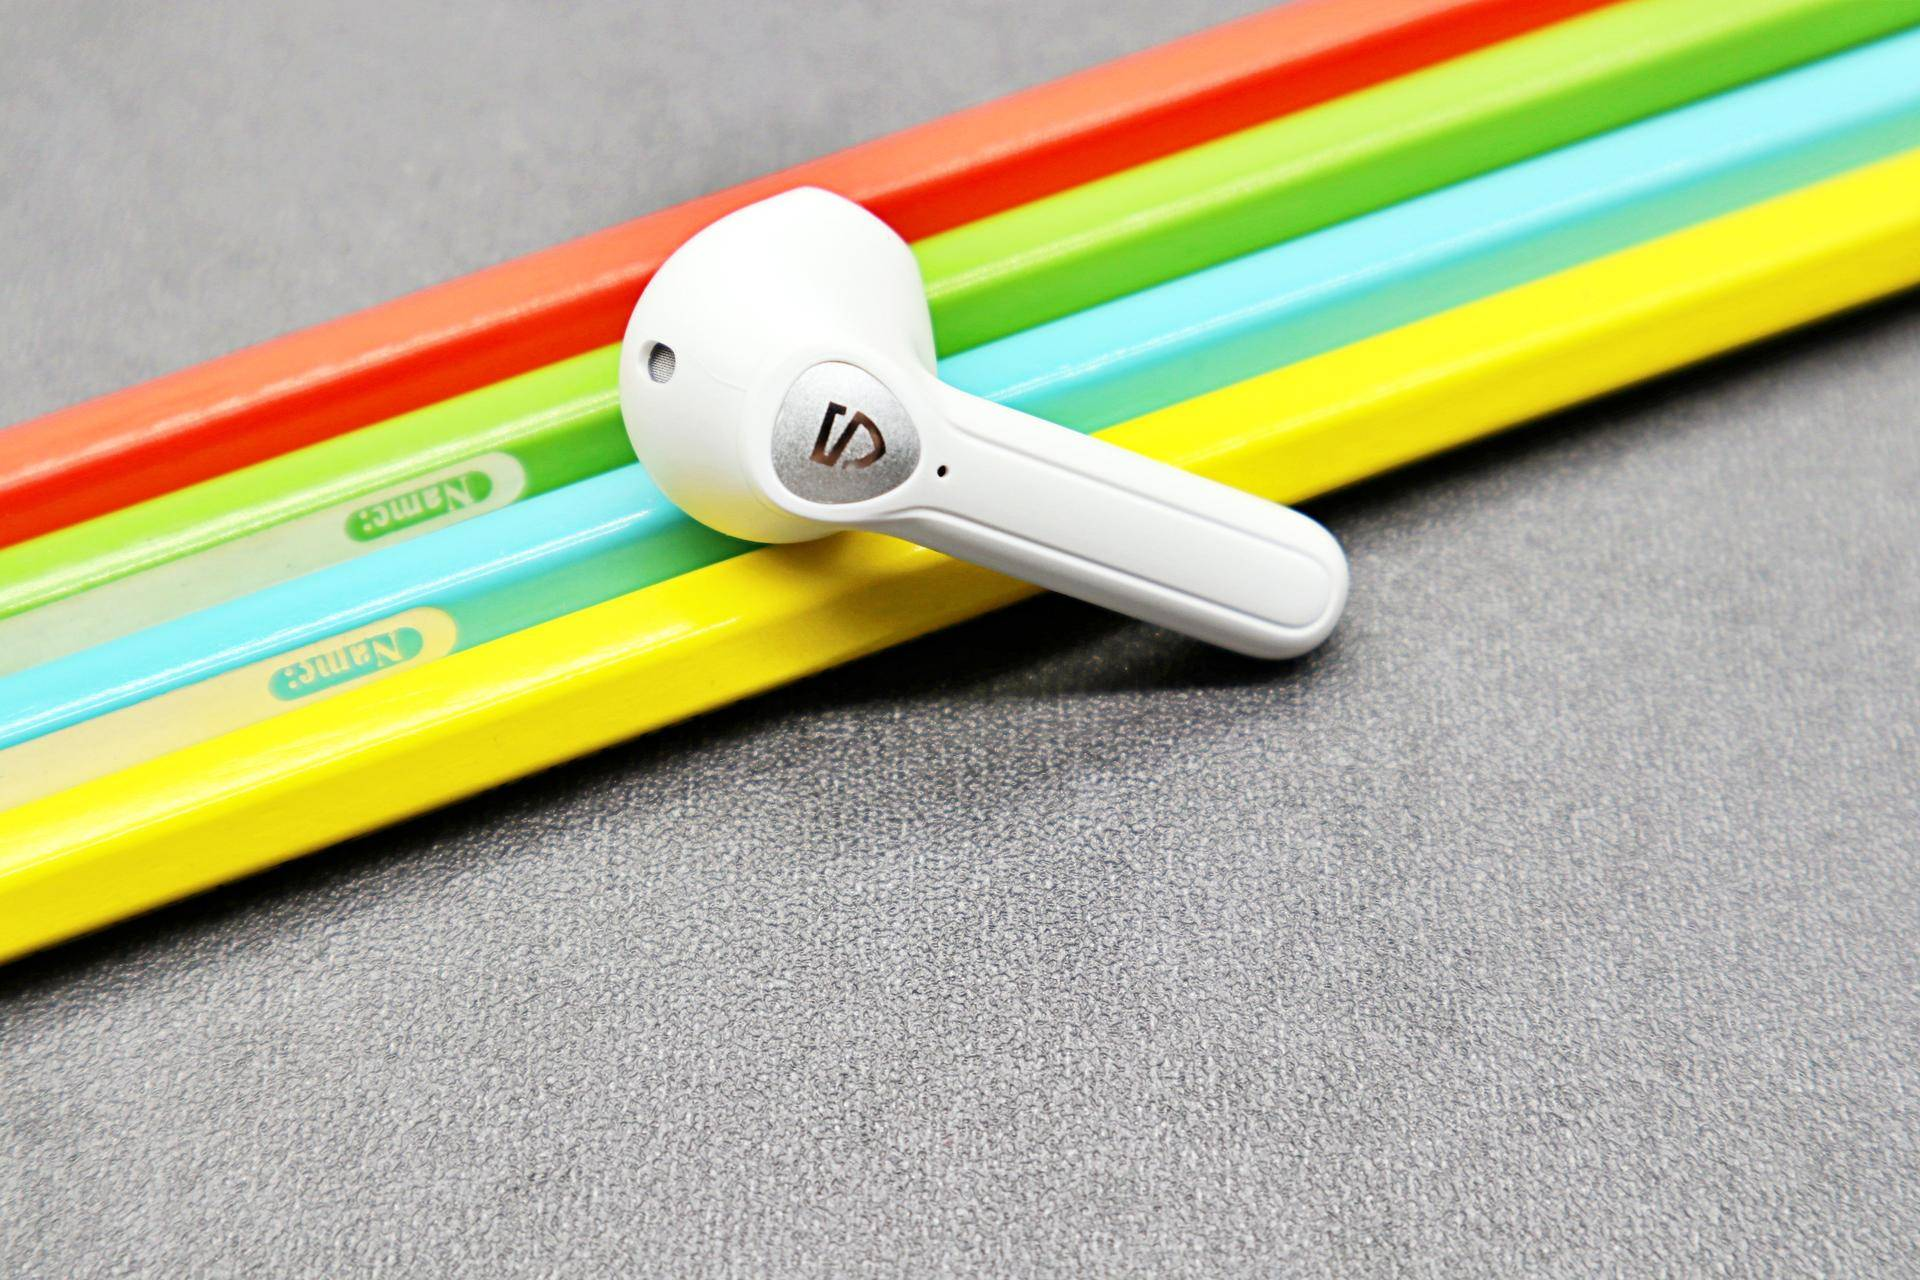 SoundPEATS trueair2真无线蓝牙耳机,百元级好选择